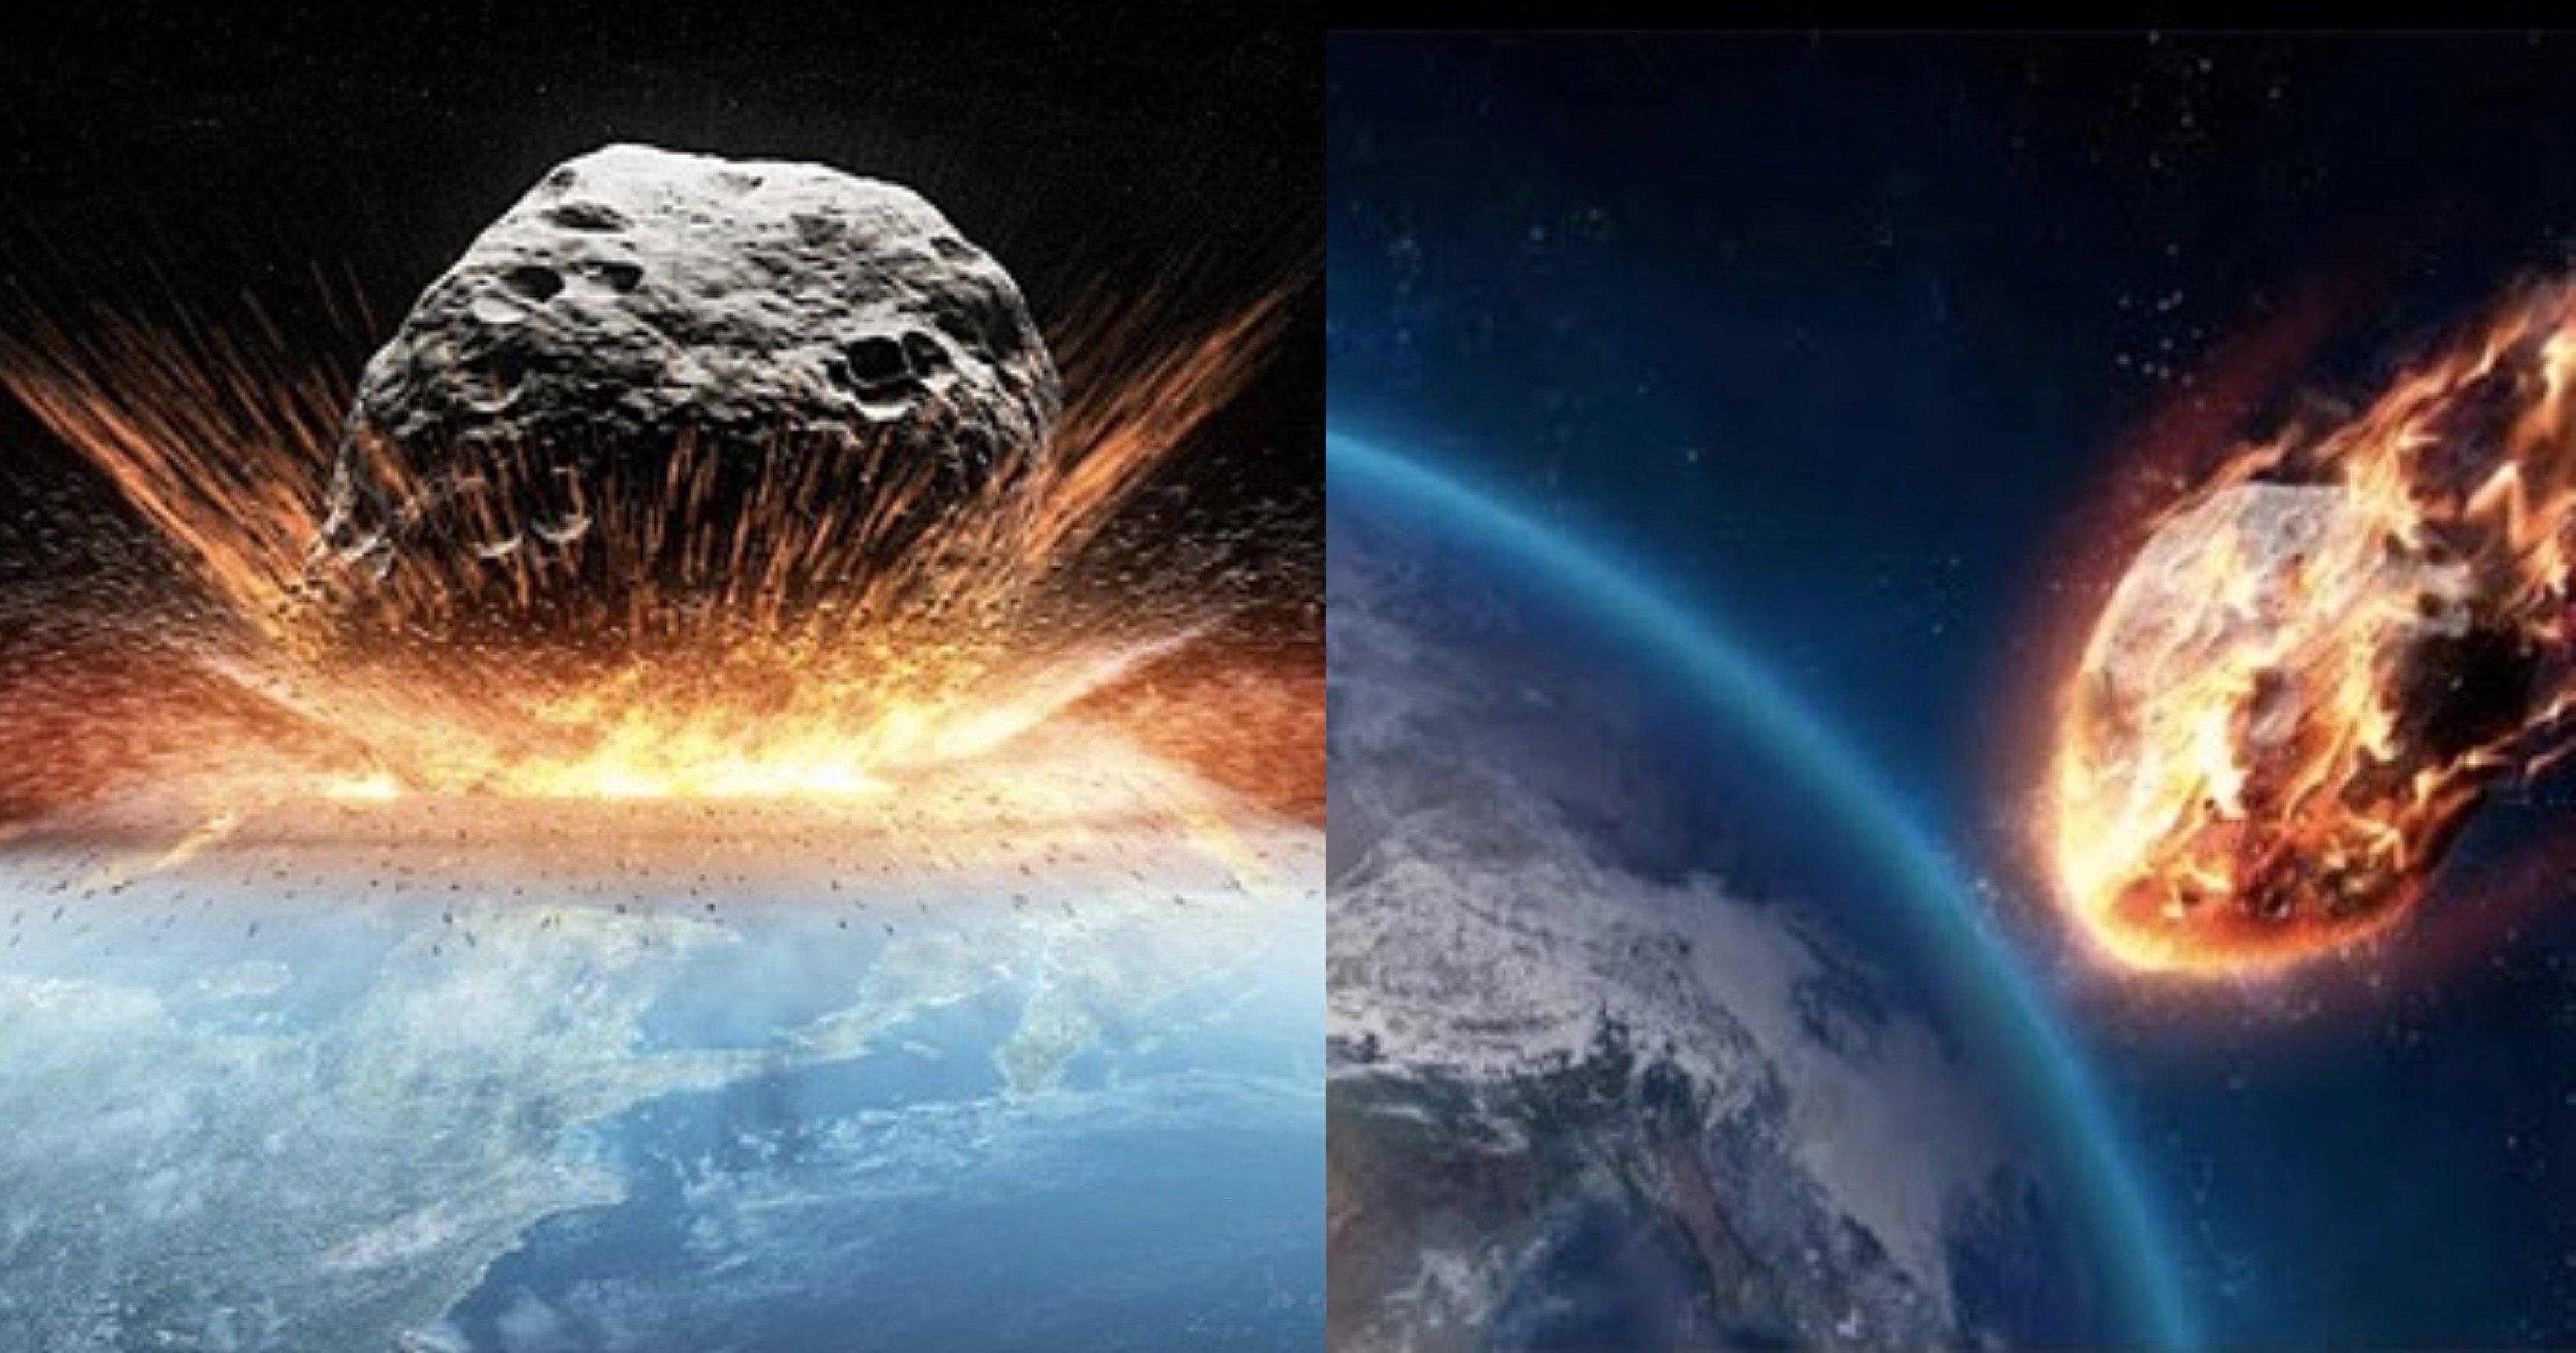 "f477af7b 4530 4de3 9c50 b62606071741.jpg?resize=1200,630 - ""헐 자칫하면 지구 파괴할 수 있다고?""...거리두기 끝나는 6일,  '초대형 소행성' 지구로 날아온다"